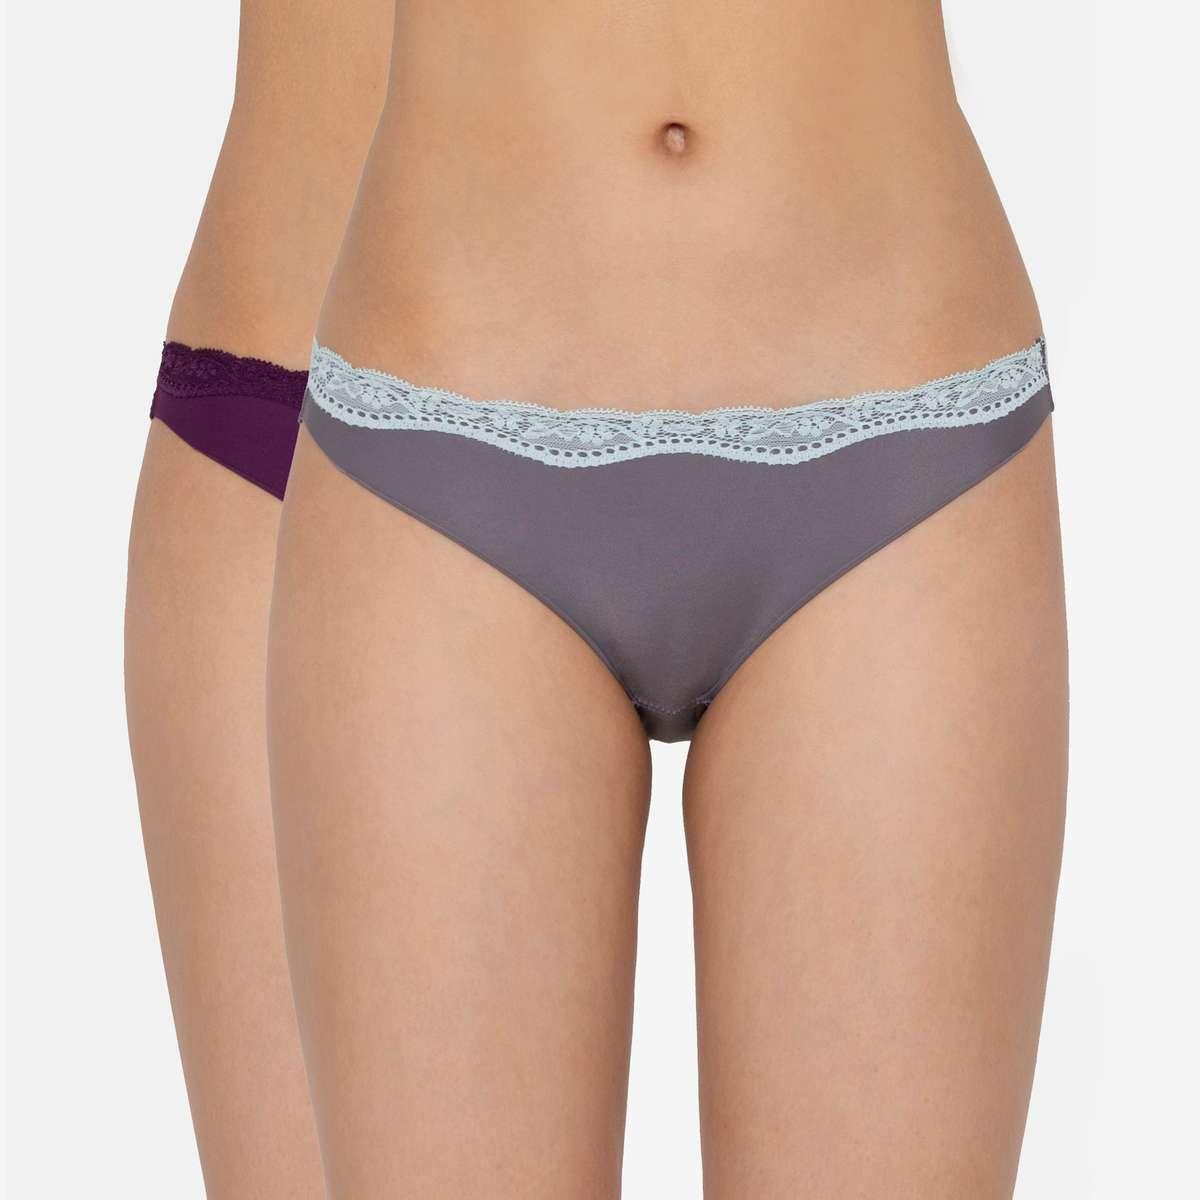 6.TRIUMPH Stretty Everyday Microfibre Bikini Lace Panties - Pack of 2